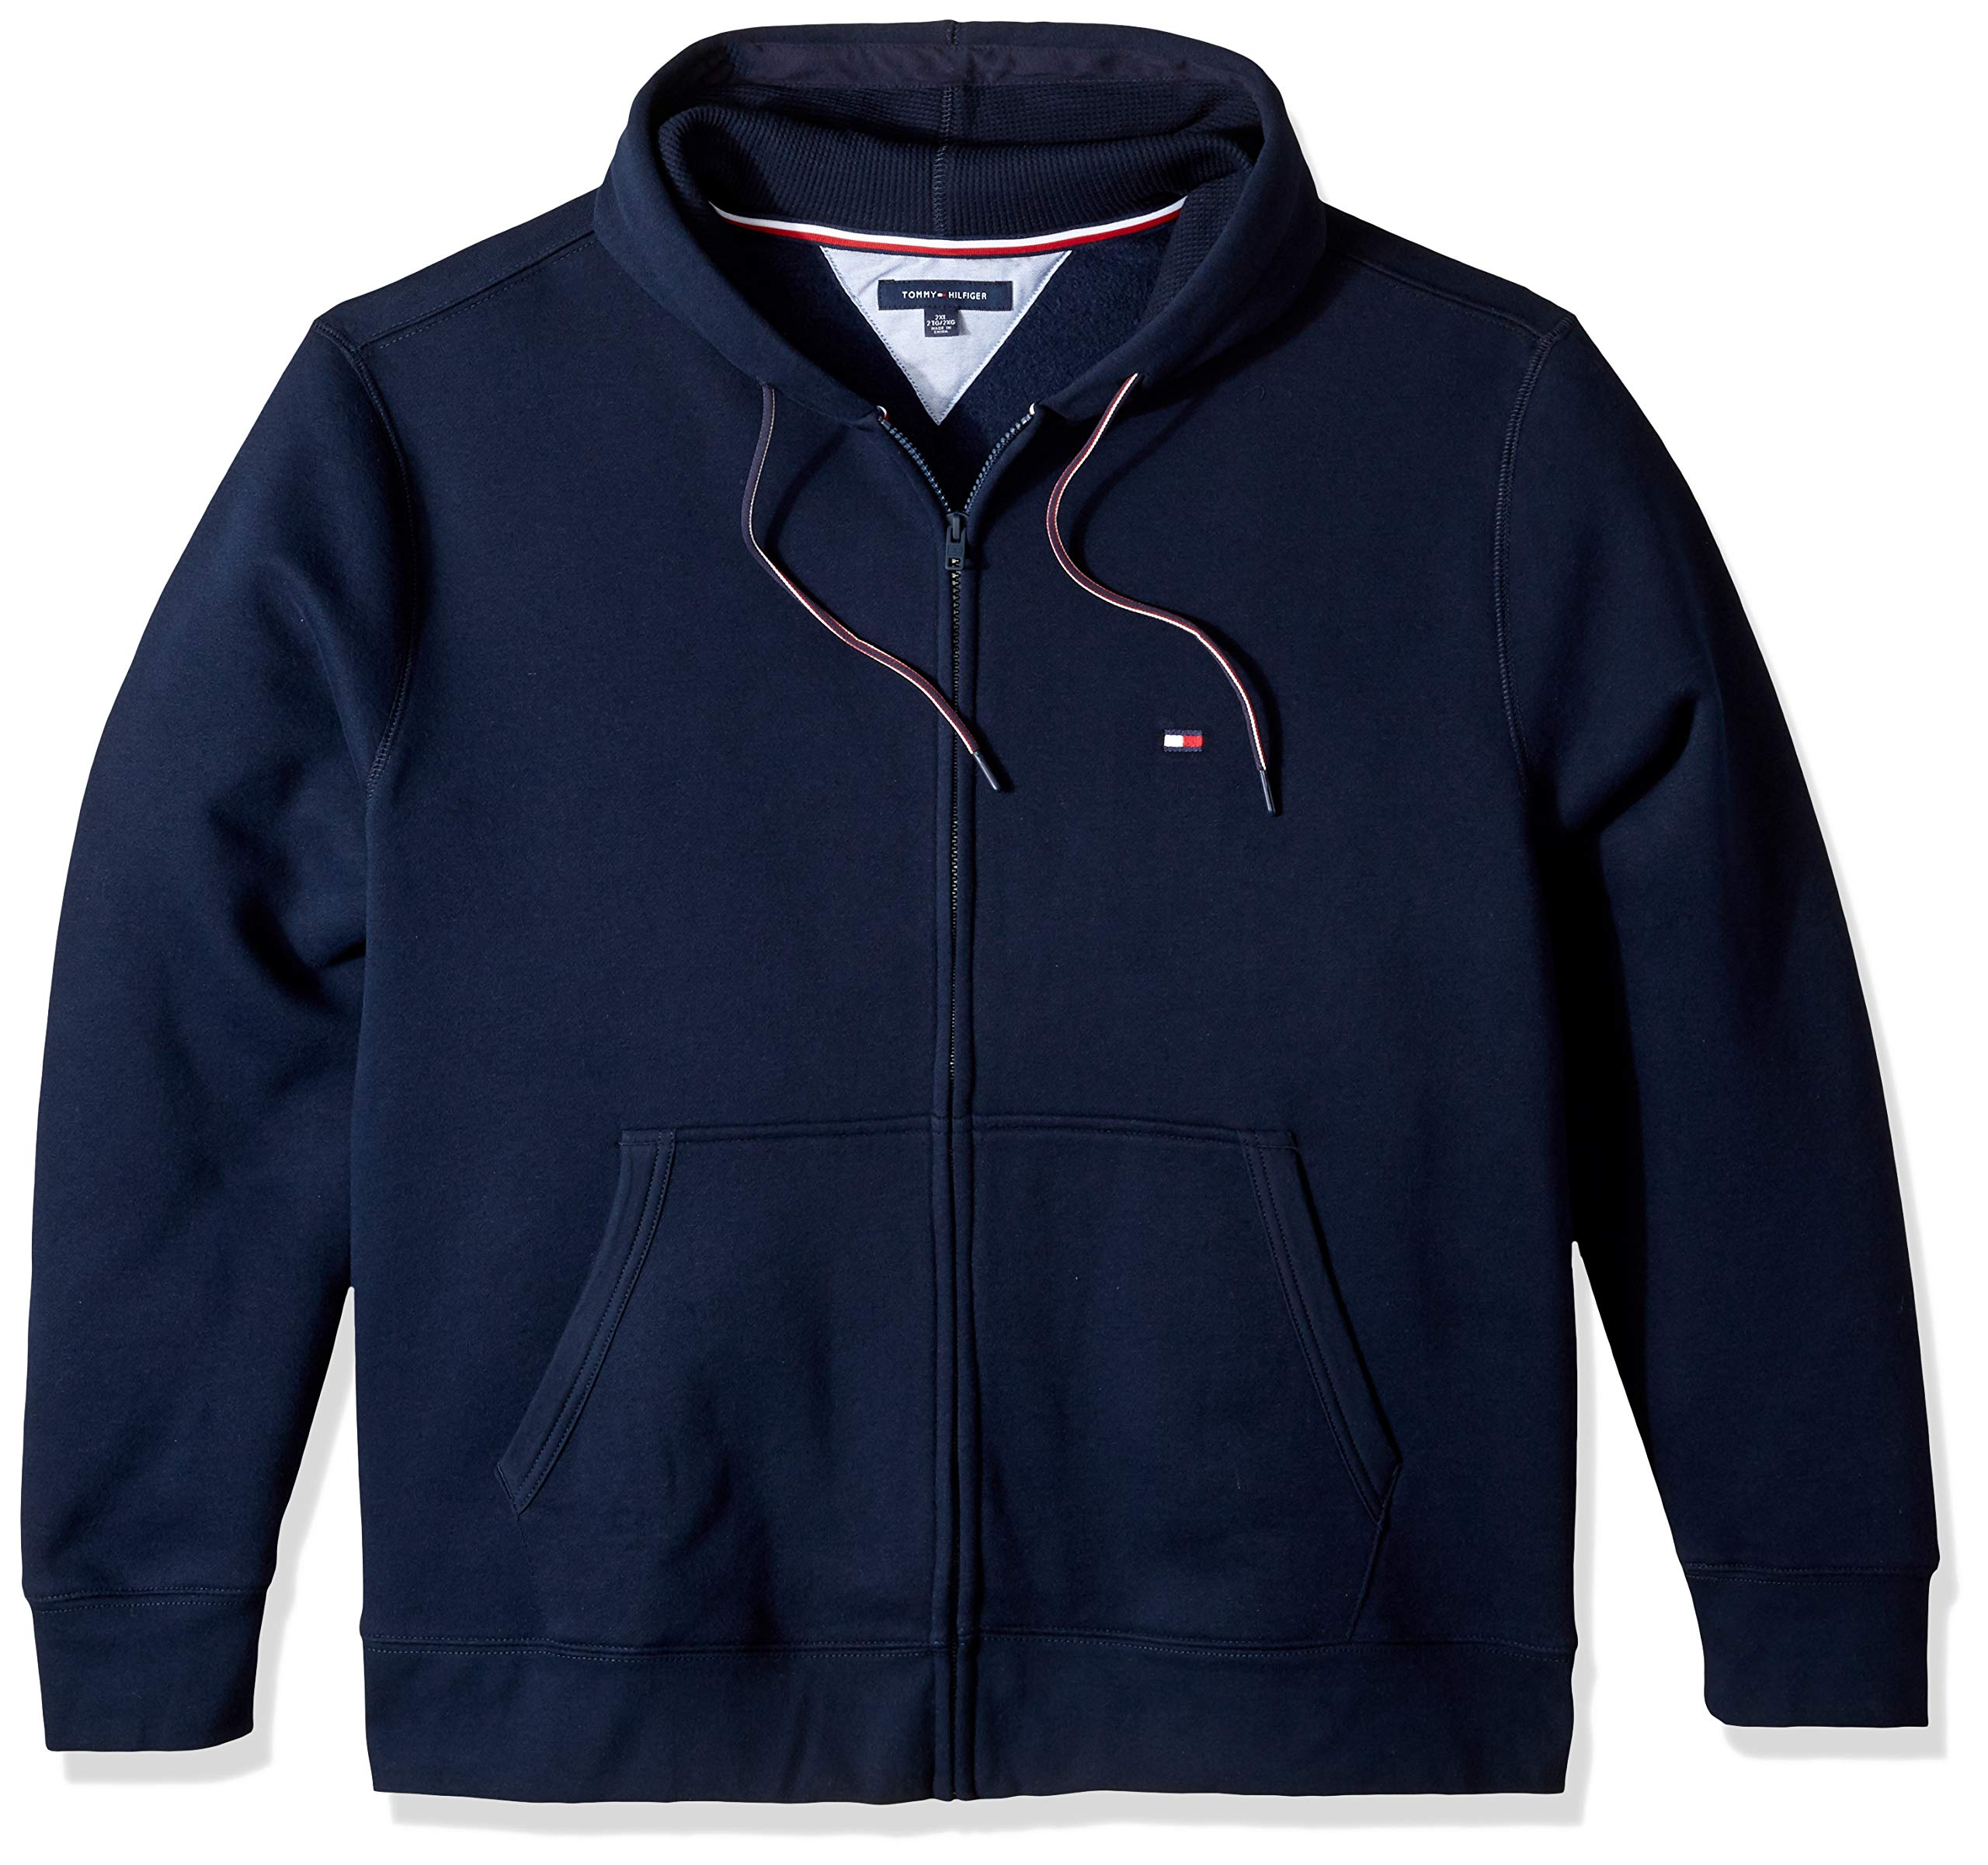 Tommy Hilfiger Men's Big and Tall Hoodie Sweatshirt, navy blazer, BG- 4XL